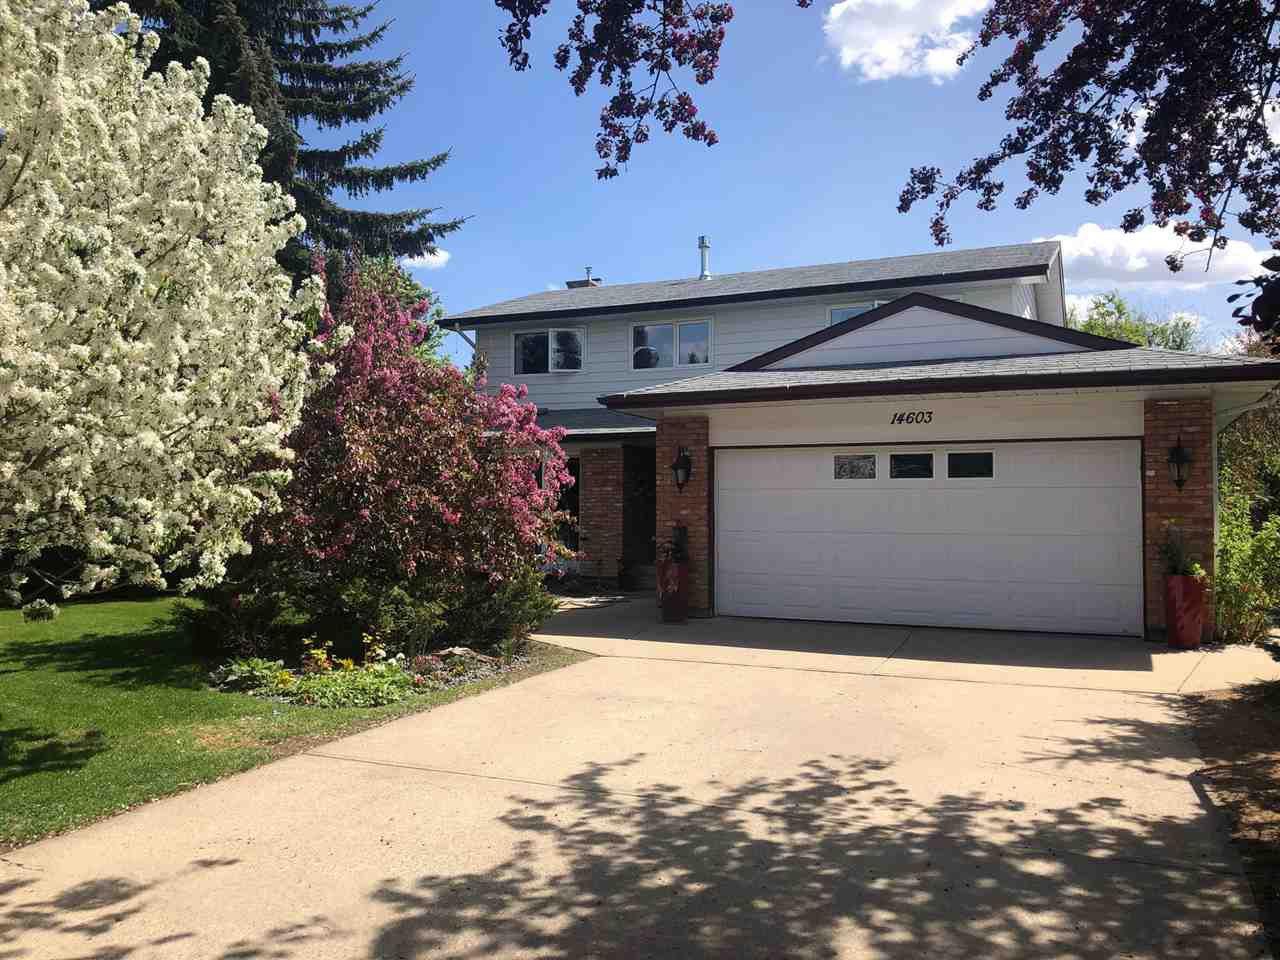 Main Photo: 14603 63 Avenue in Edmonton: Zone 14 House for sale : MLS®# E4200406